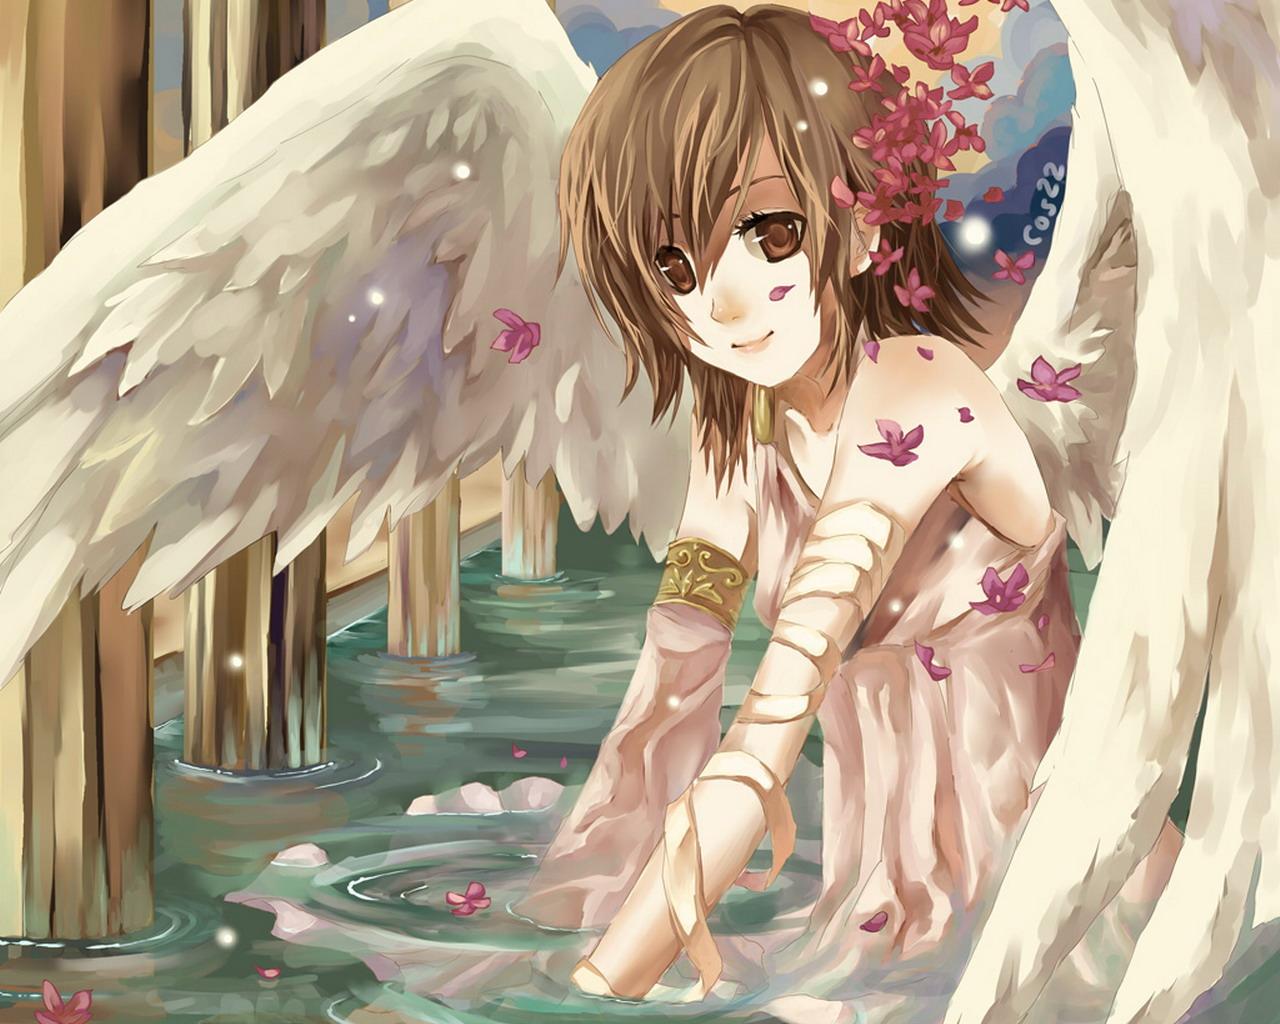 Worrior Angel love angels 23308613 1280 1024